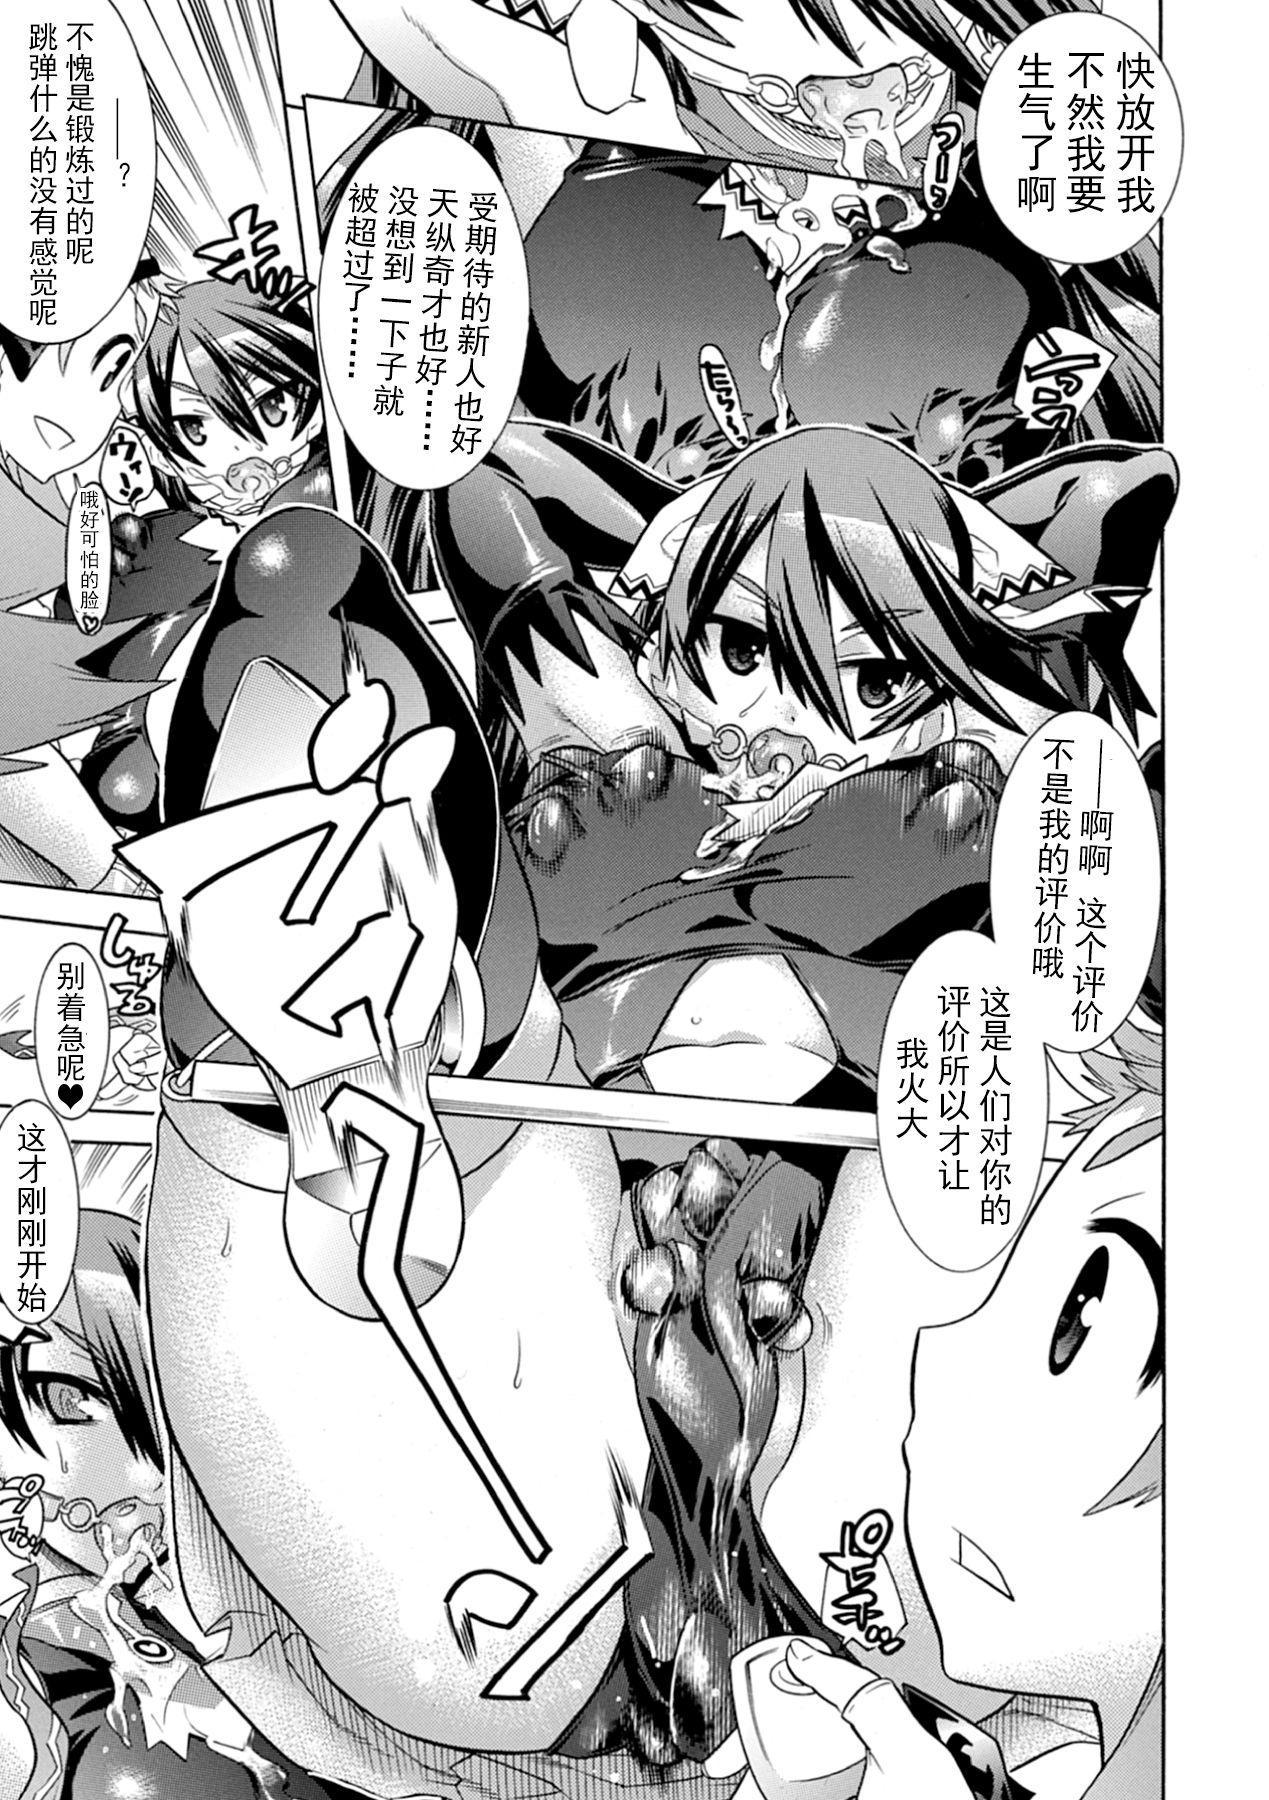 Jintai Kaizou Anthology Comics Vol. 1 27